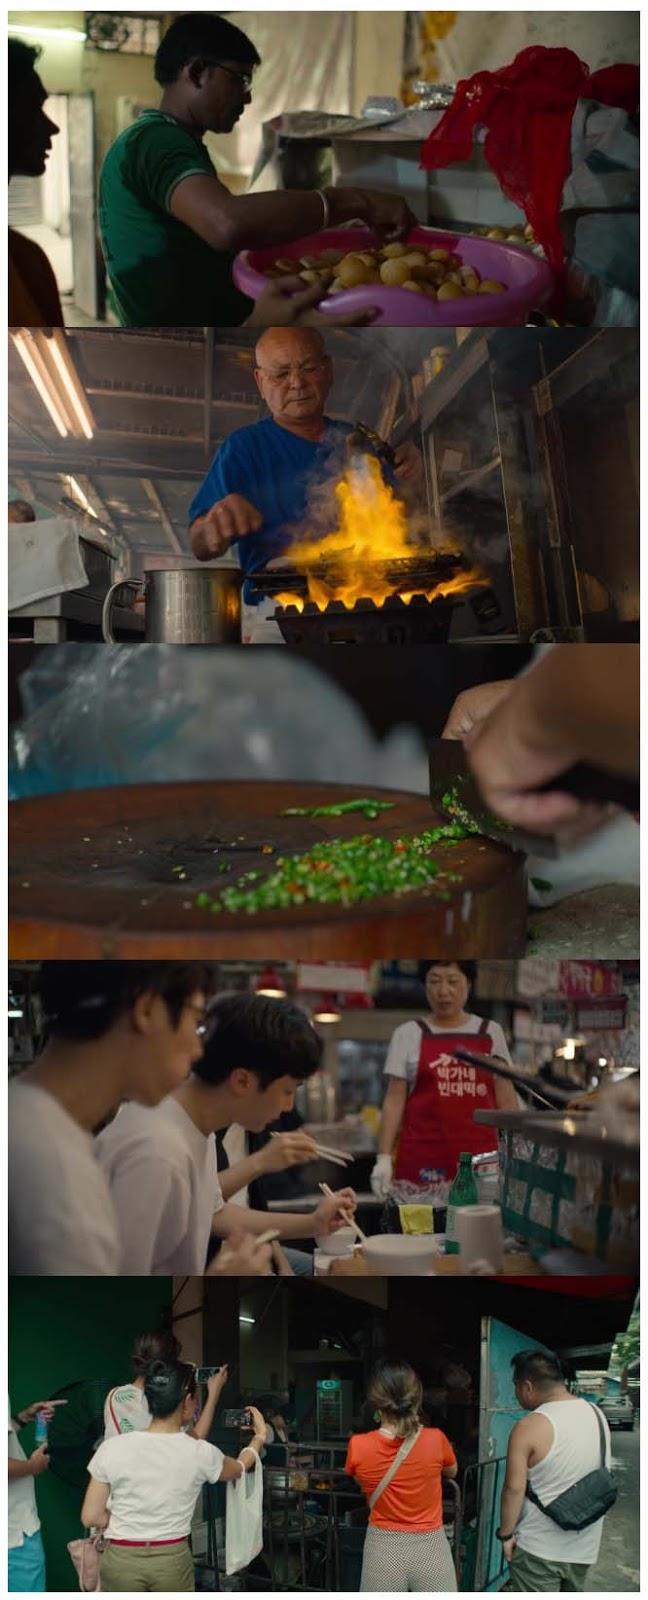 Street Food {Season 1} [Hindi-English] [Netflix Series] 480p WEB-DL 850MB Desirehub